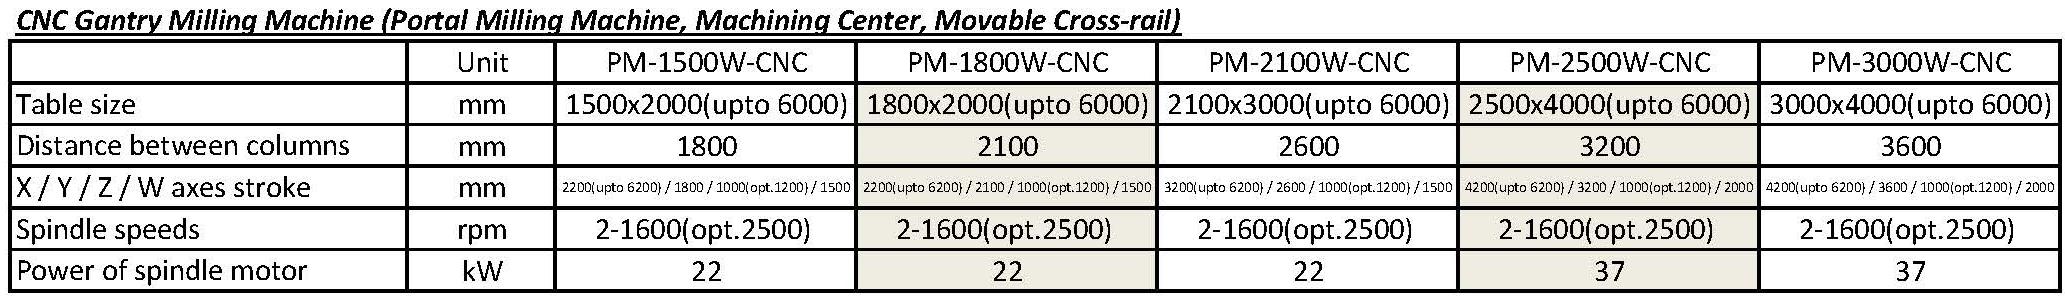 技术参数 - PM-W-CNC